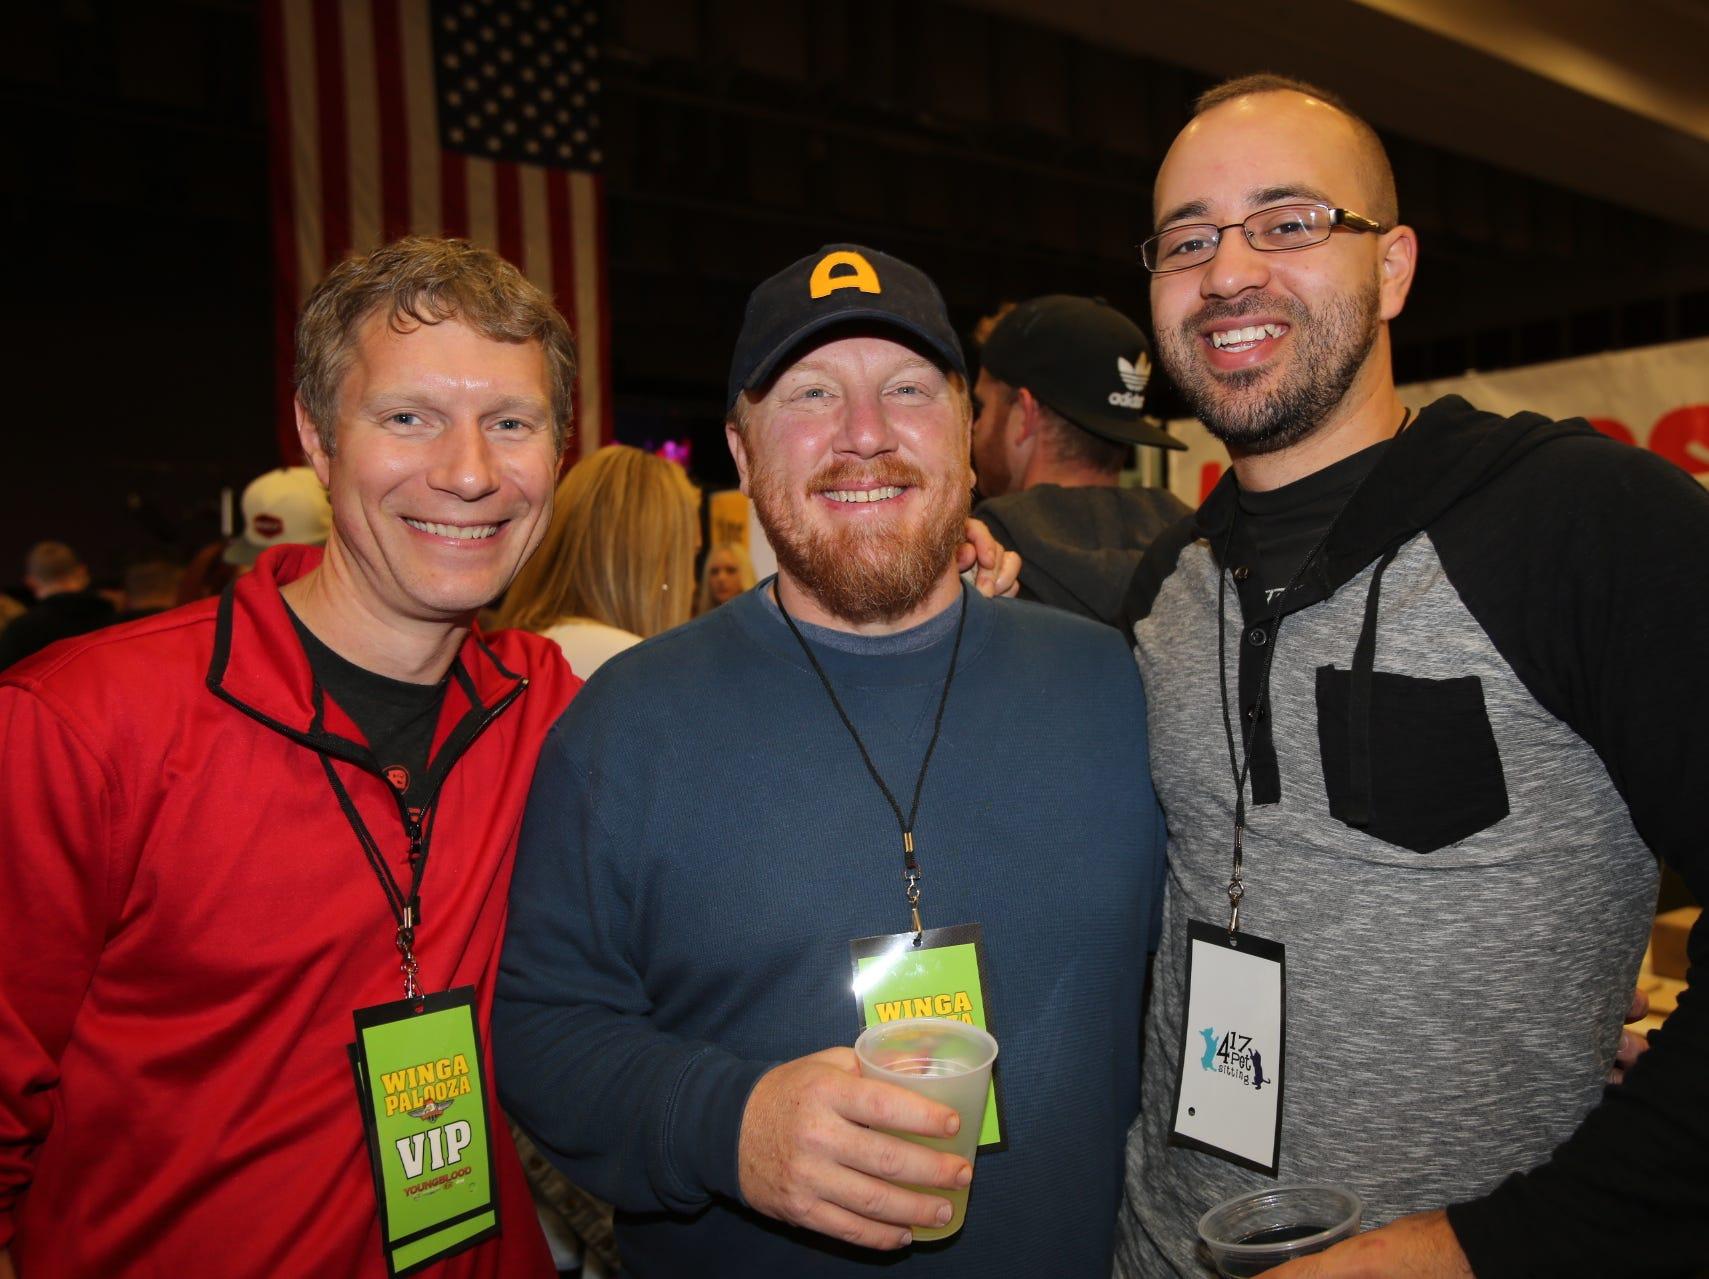 John Paul Chapman, Chris Rohrbaugh, and Joe Forney